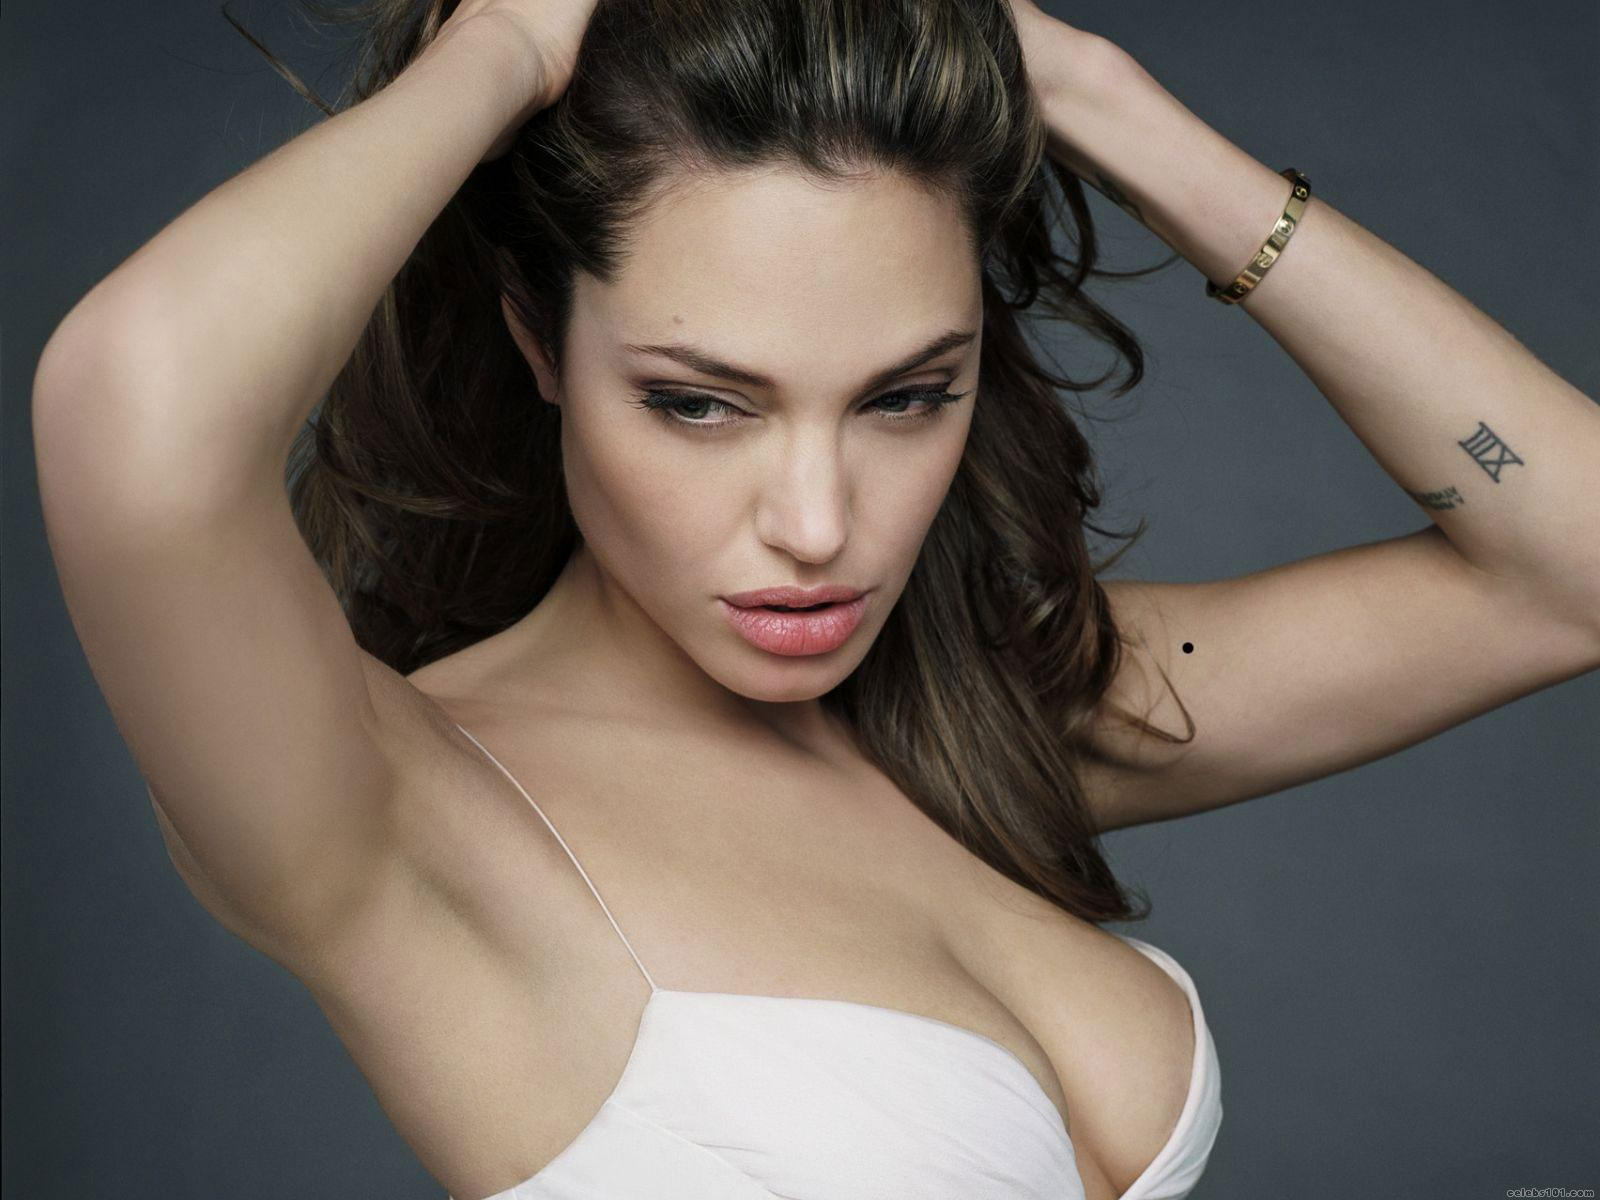 http://3.bp.blogspot.com/-gUvatYl4MN4/TzyaFtwzwkI/AAAAAAAAFeo/kTjZlbSYOn8/s1600/Angelina_Jolie_118.jpg